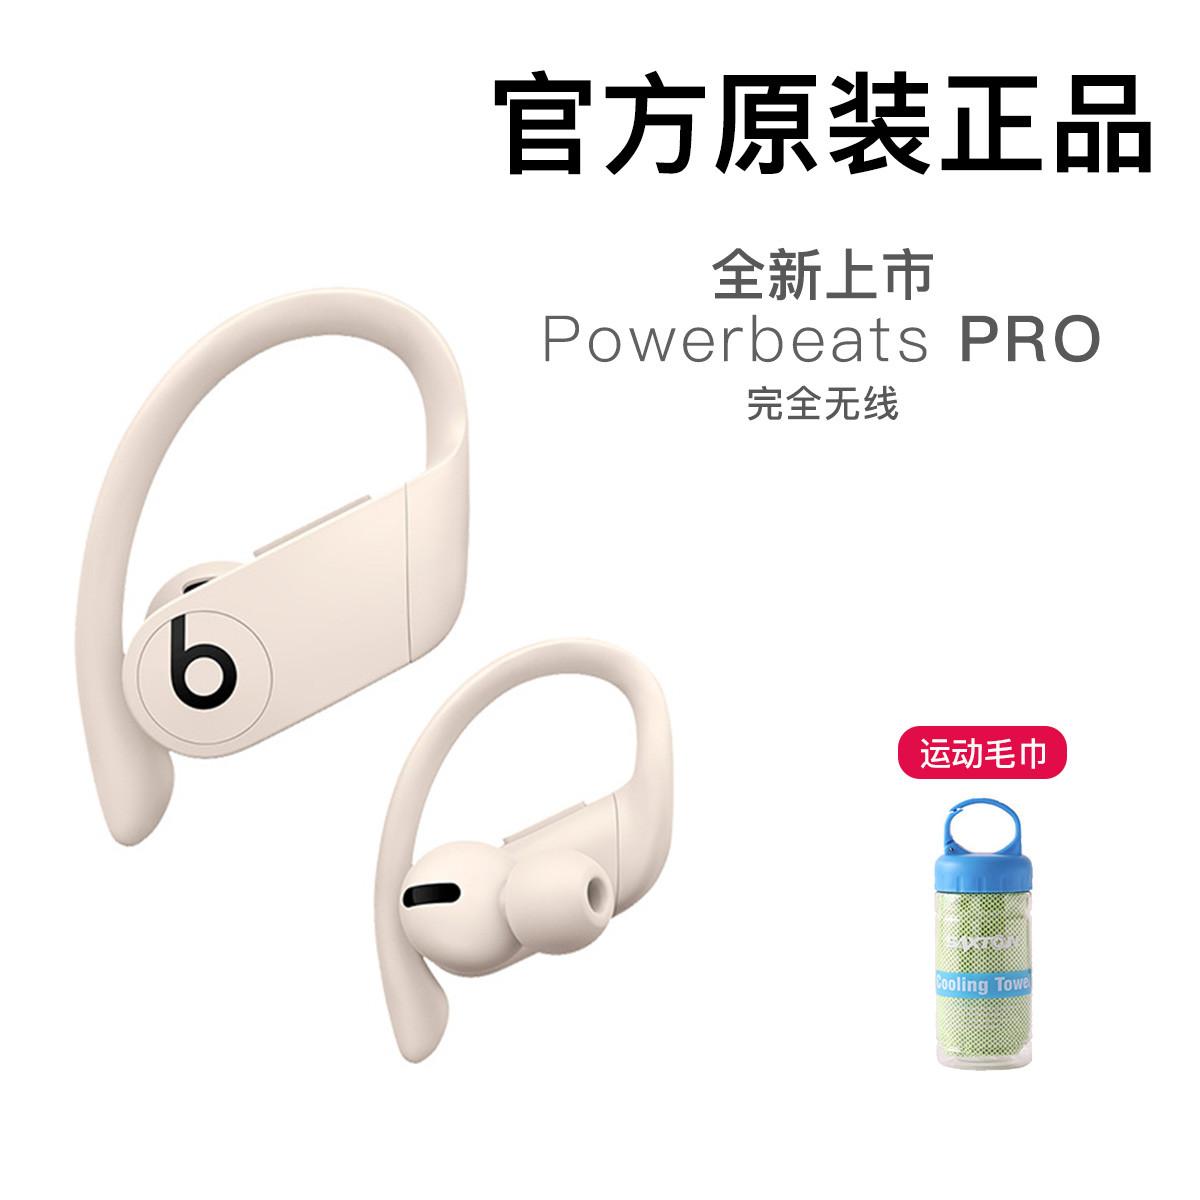 Powerbeats Pro 苹果入耳式耳机 真无线蓝牙 运动 挂耳式 耳机